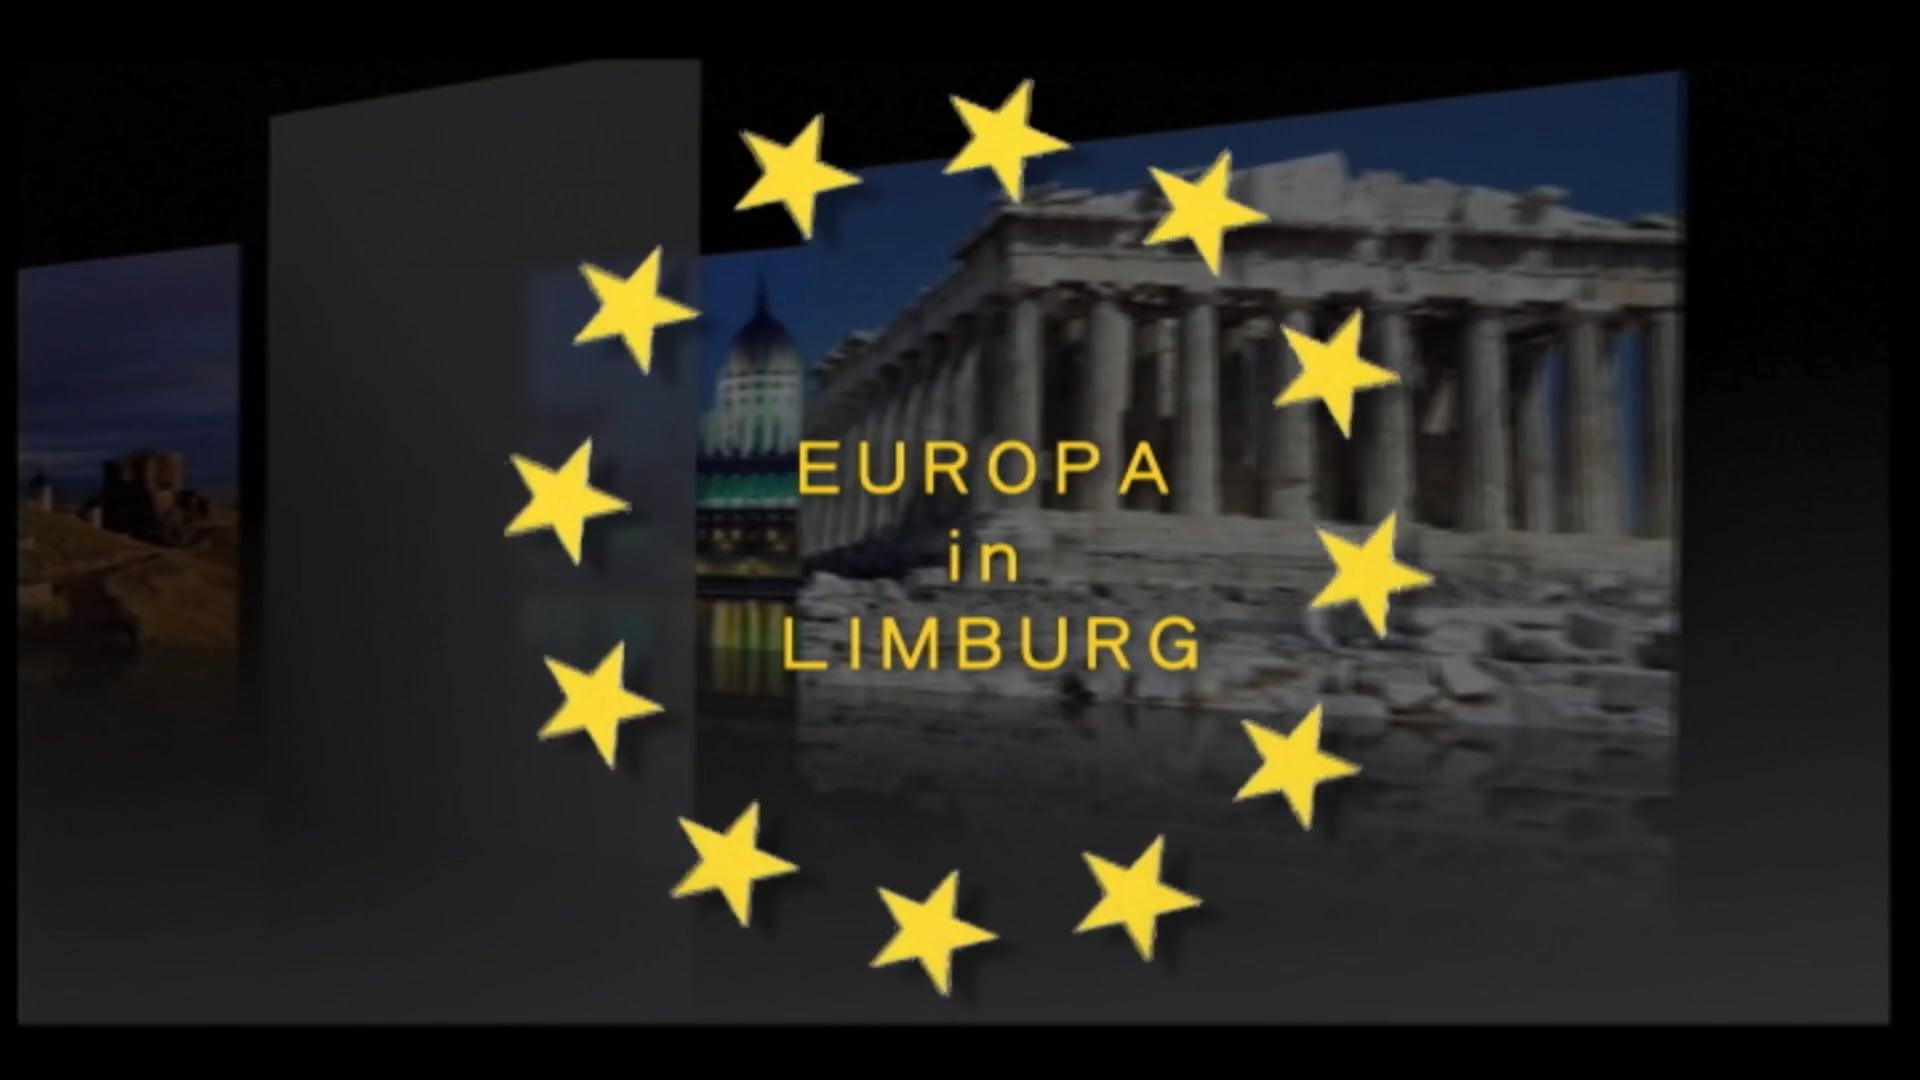 EUROPA IN LIMBURG